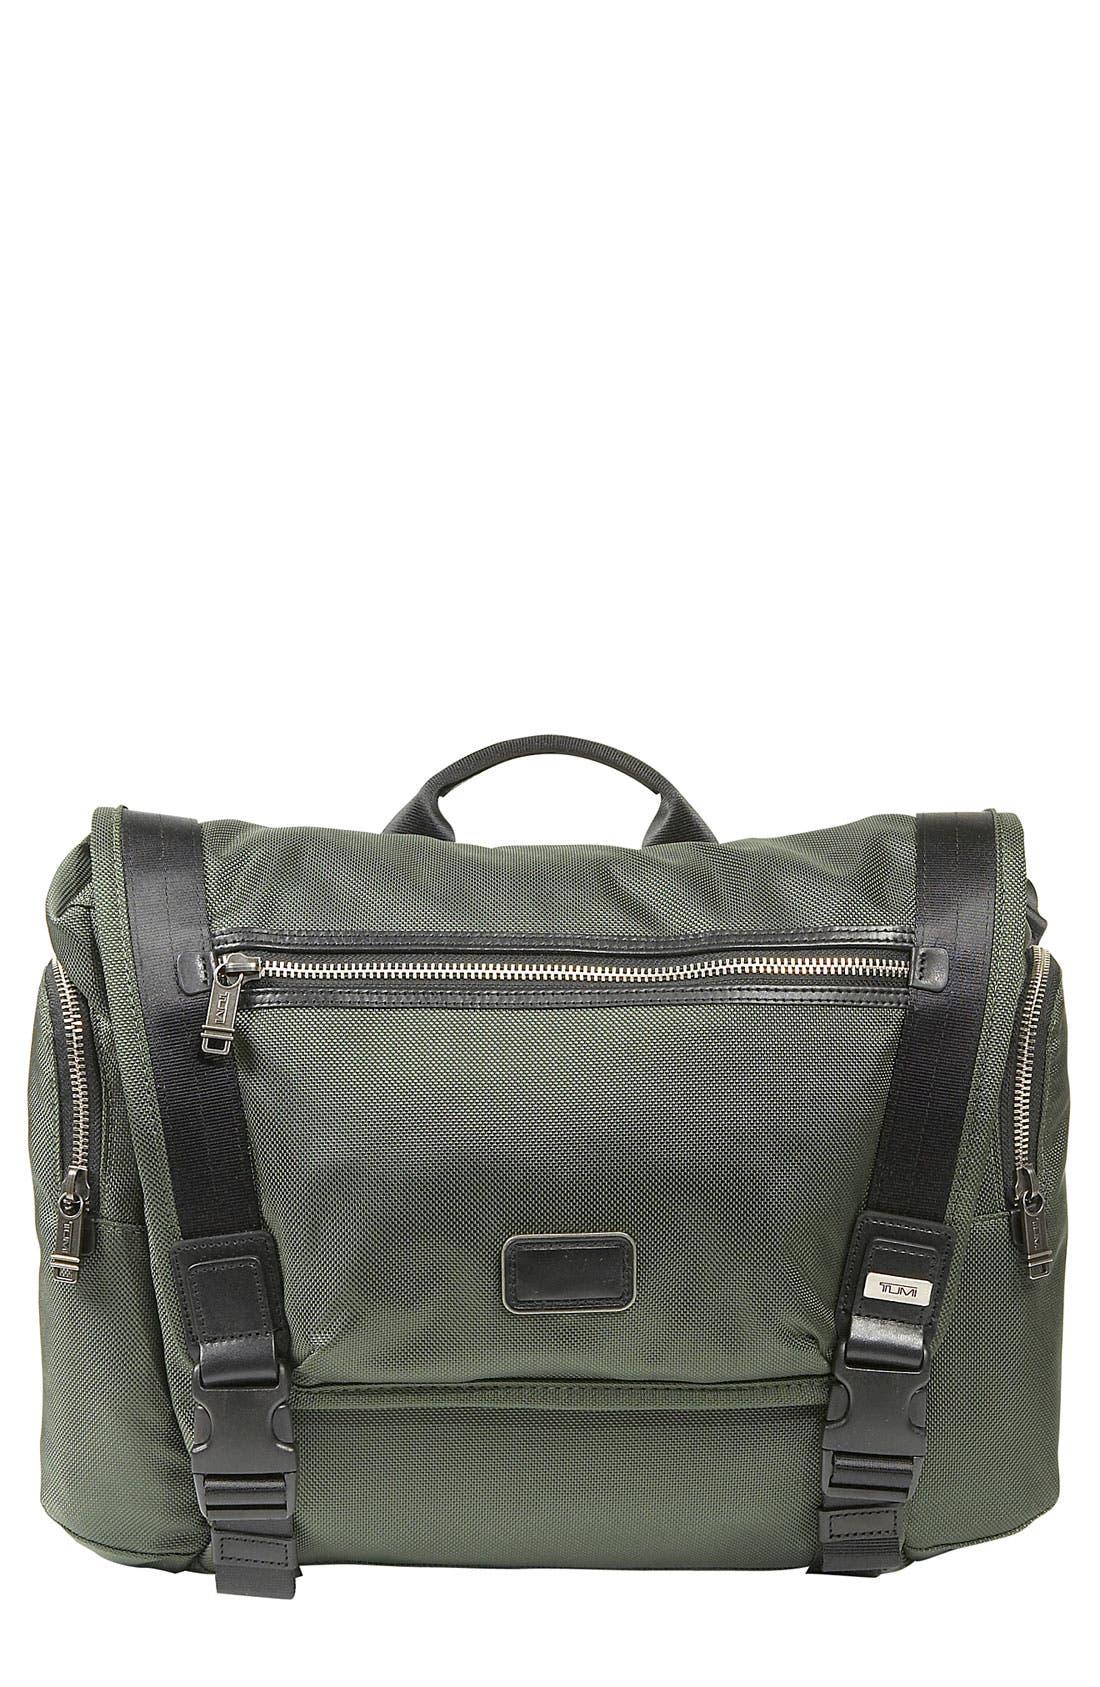 Alternate Image 1 Selected - Tumi 'Alpha Bravo - Benning' Deluxe Messenger Bag